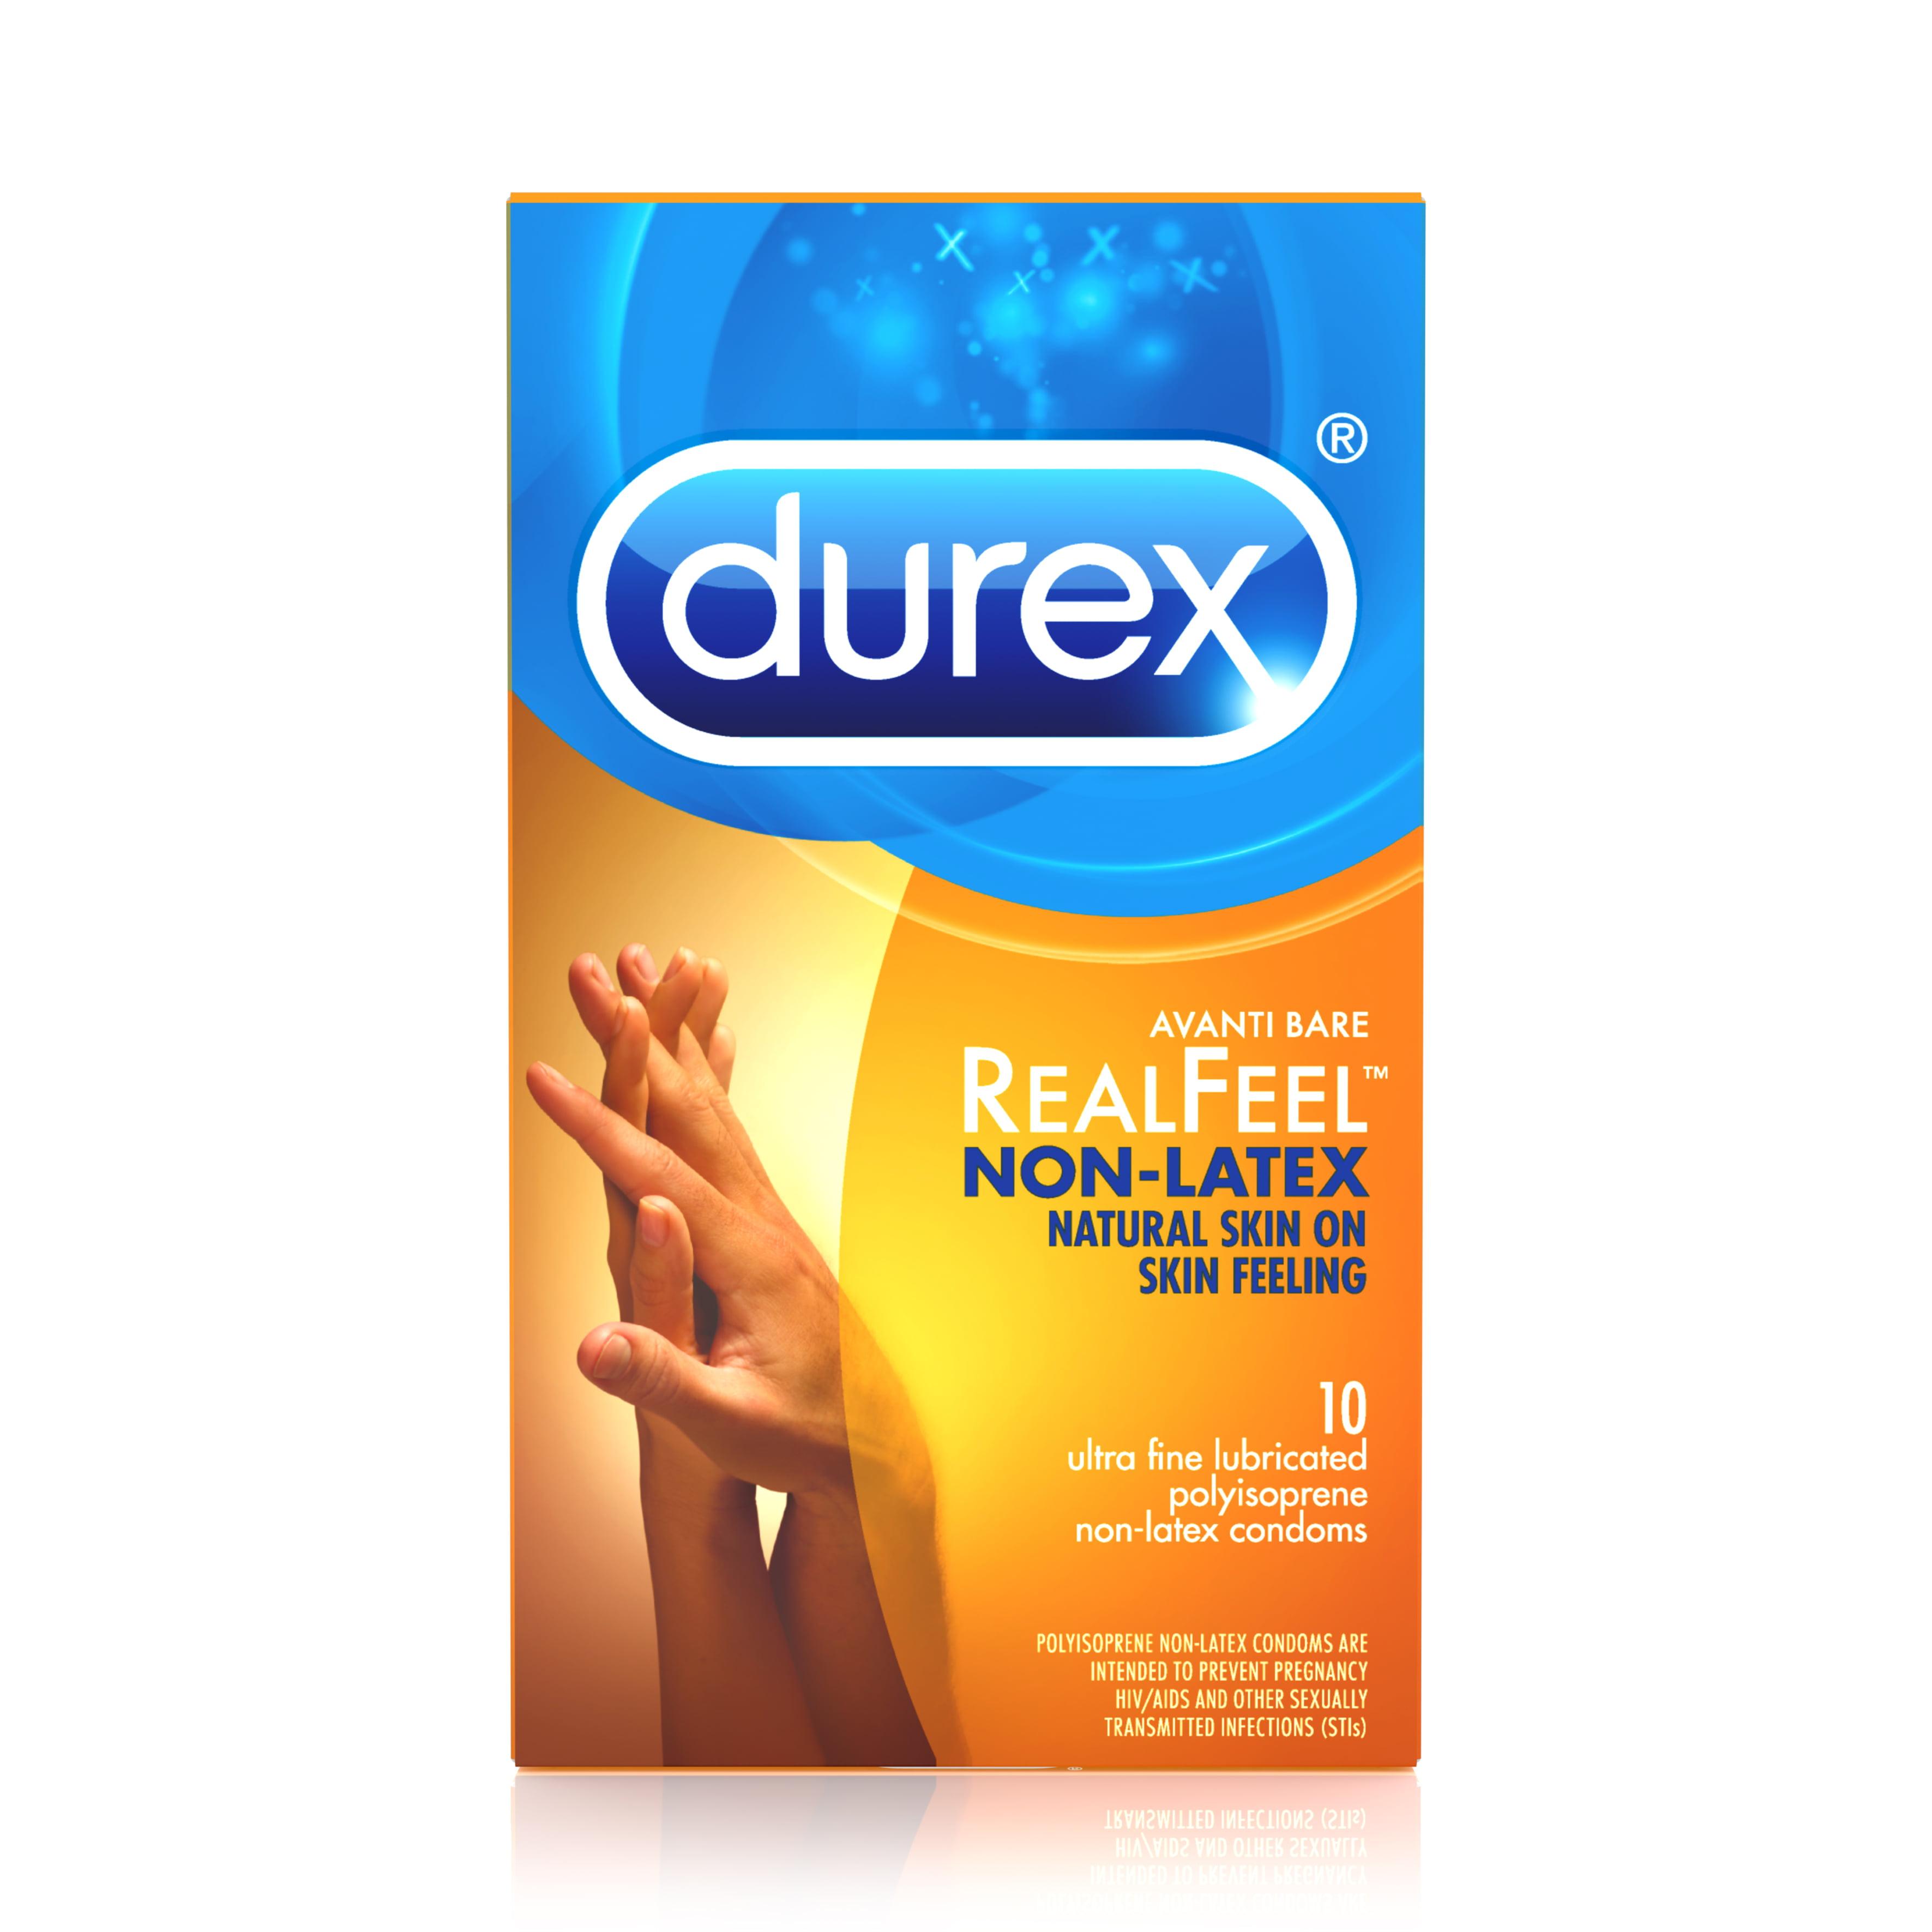 Durex Avanti Bare Ultra-Fine Lubricated Polyisoprene Non-Latex Condoms - 10 Count